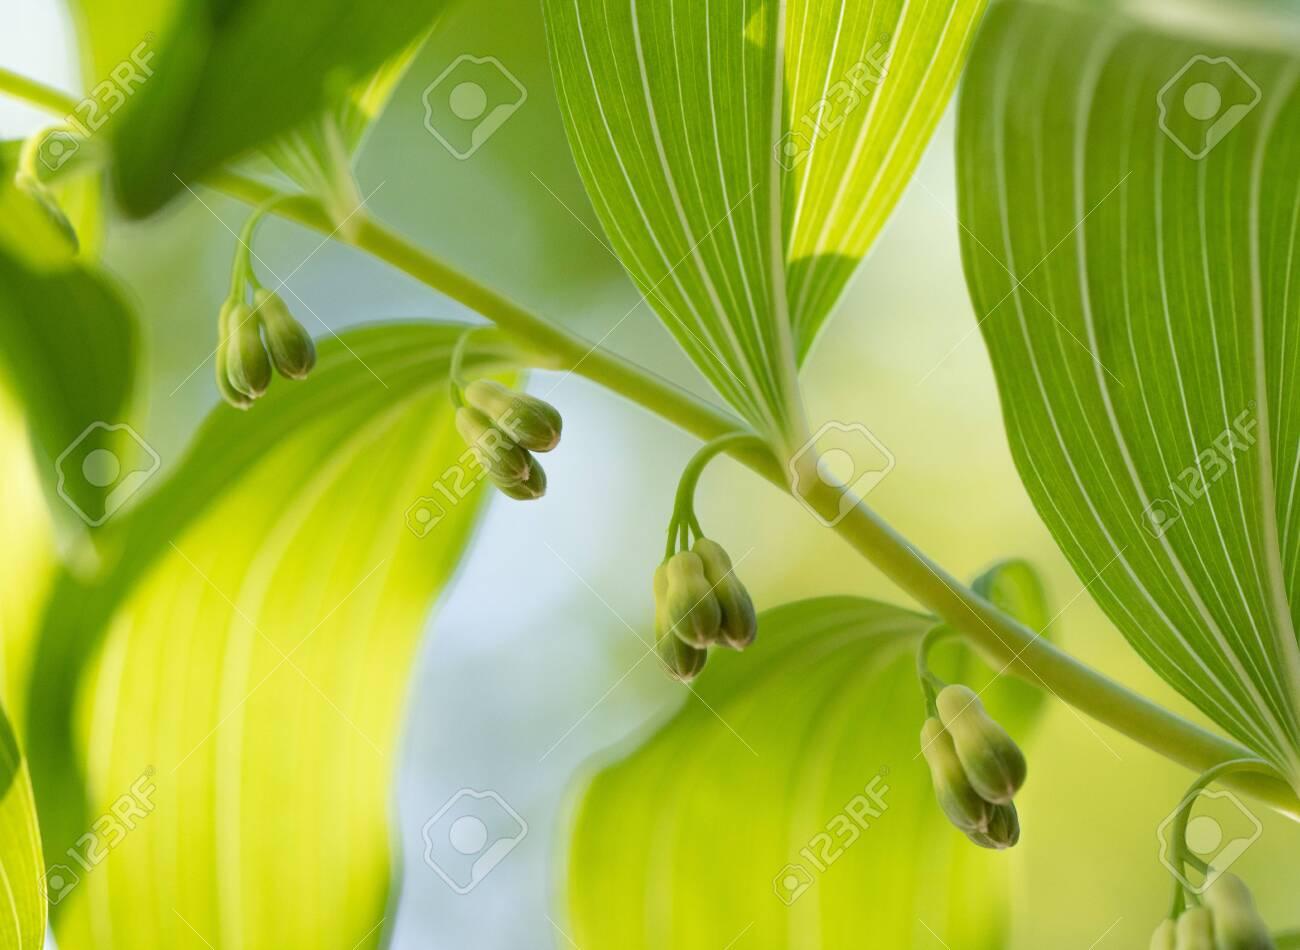 Polygonatum multiflorum fresh green spring flowers - 146418902